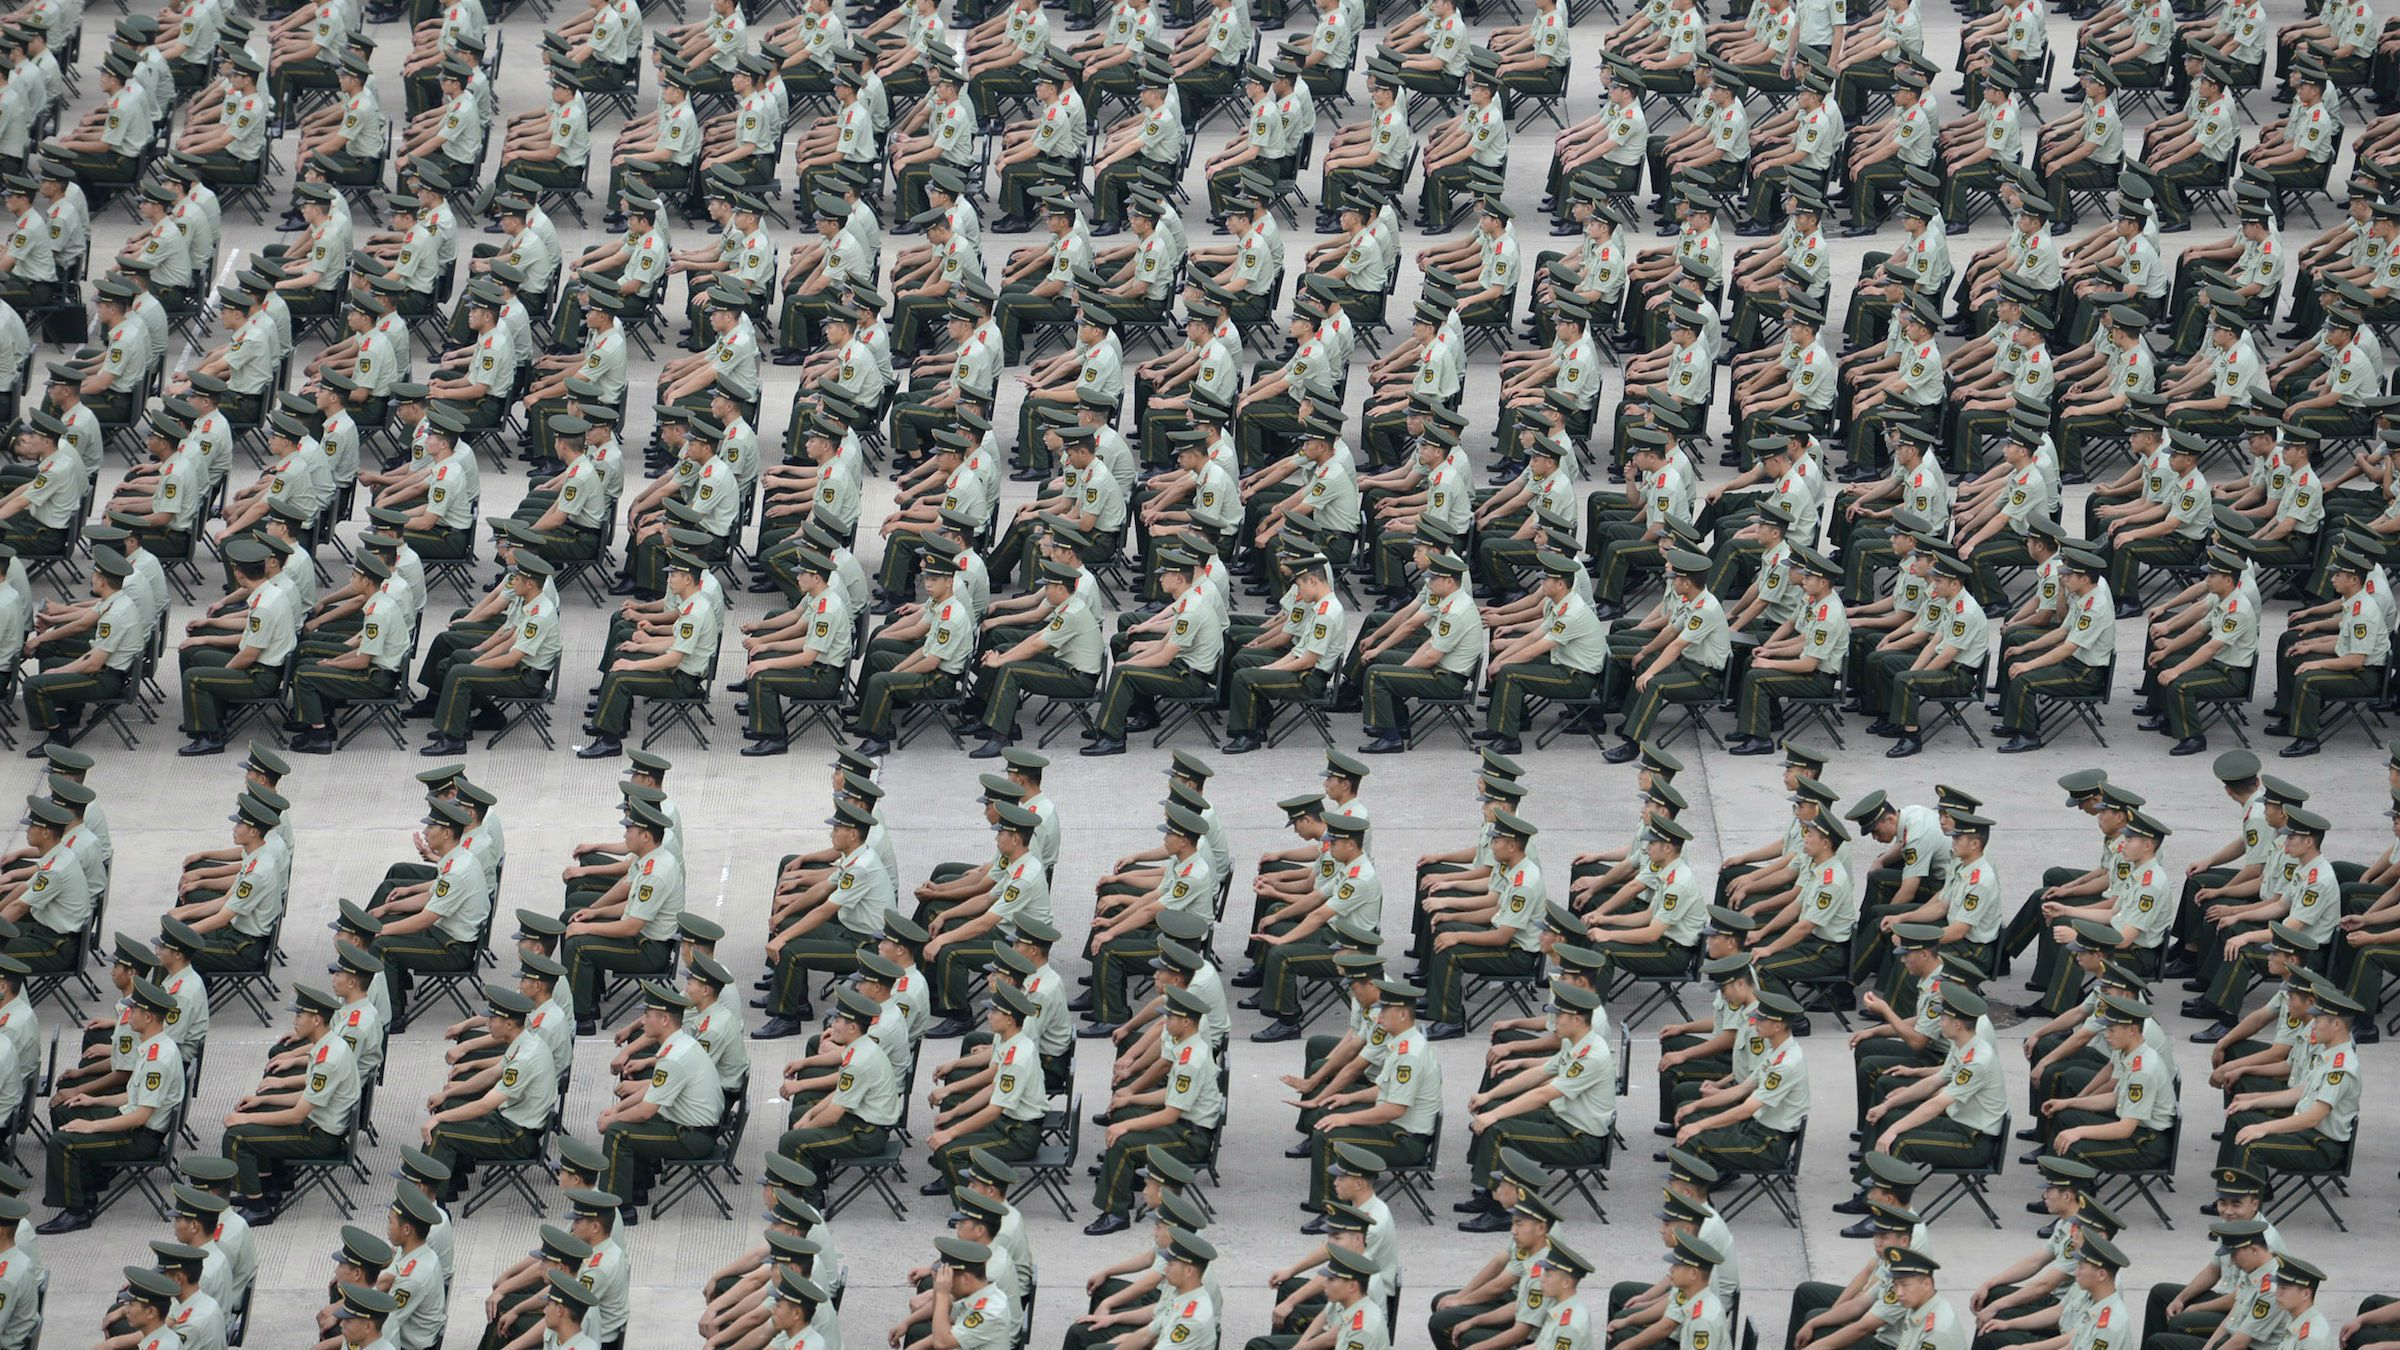 More than 1,000 Paramilitary policemen take part in an exercise in Nanjing, Jiangsu province, September